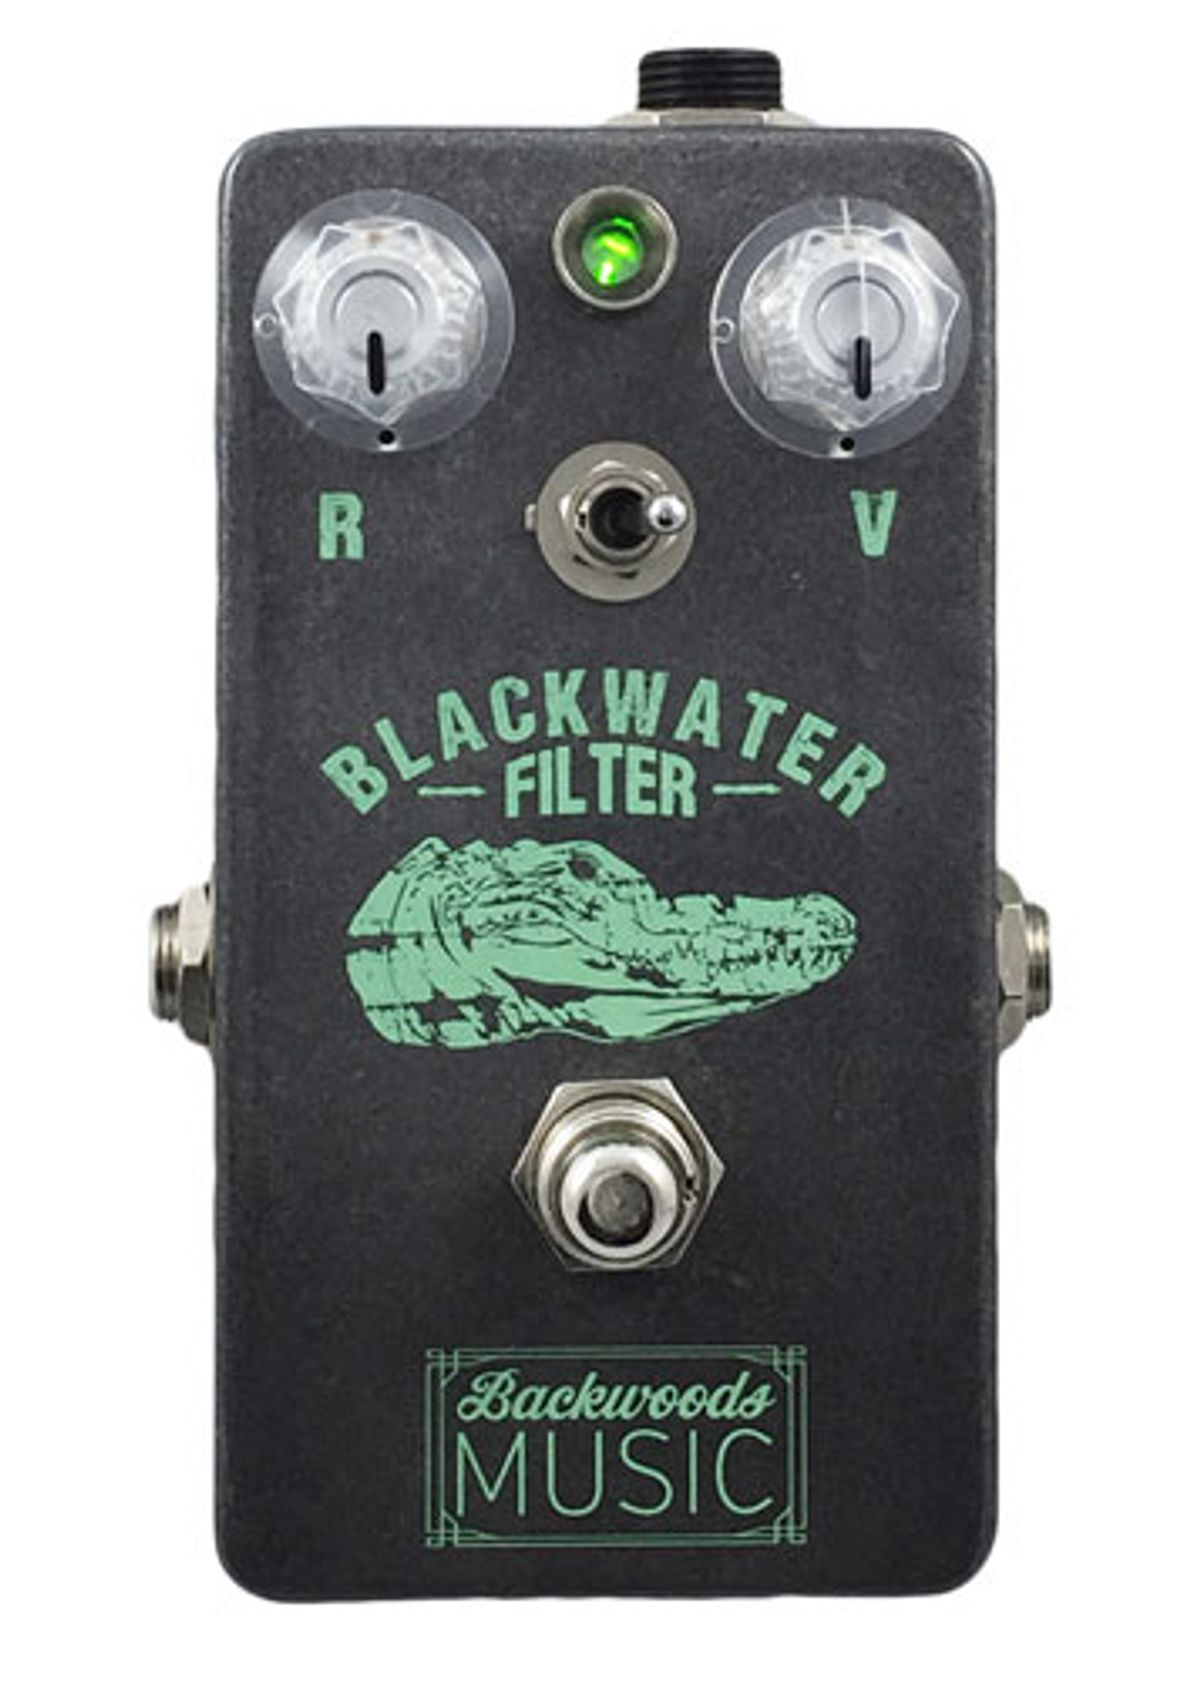 Backwoods Music Unveils Blackwater Filter